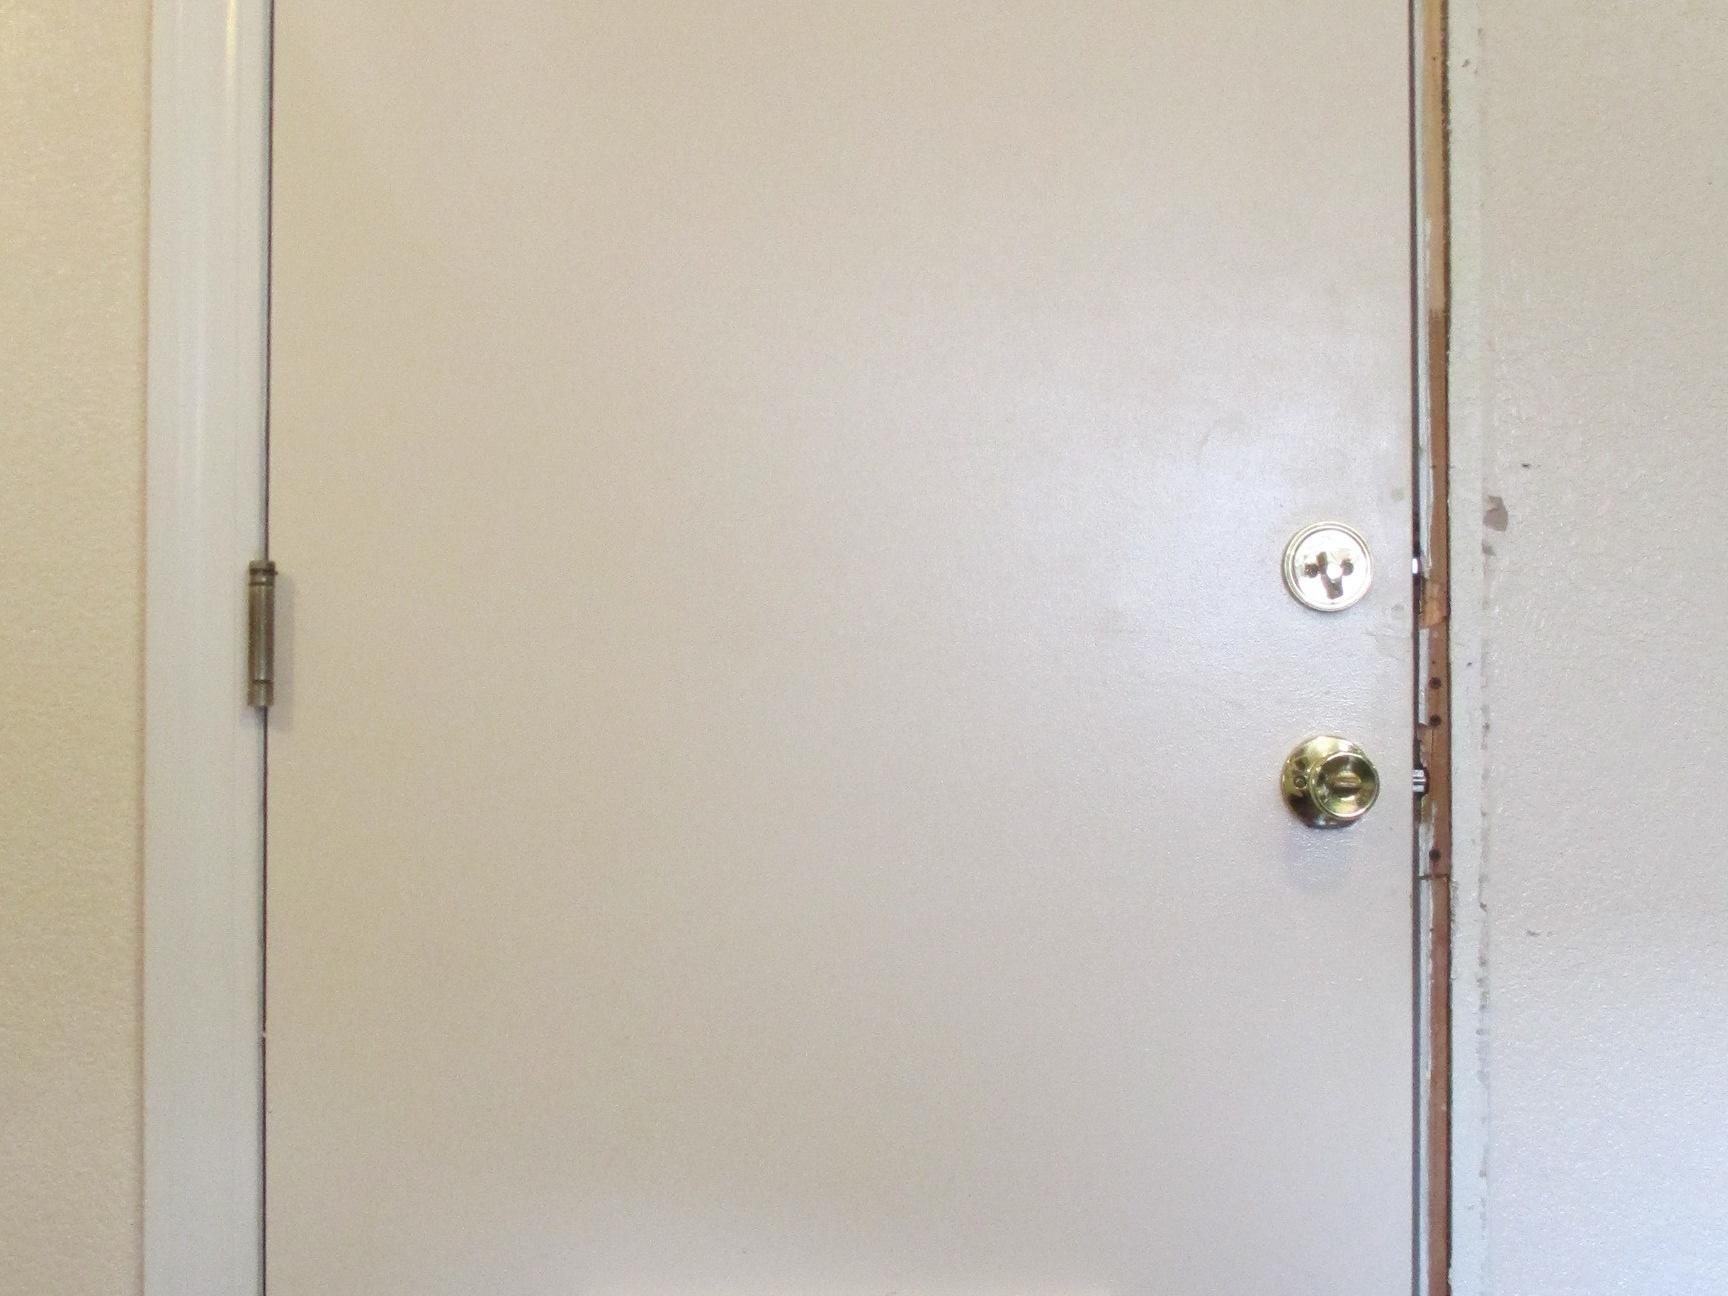 How To Replace Door Trim Ifixit Repair Guide